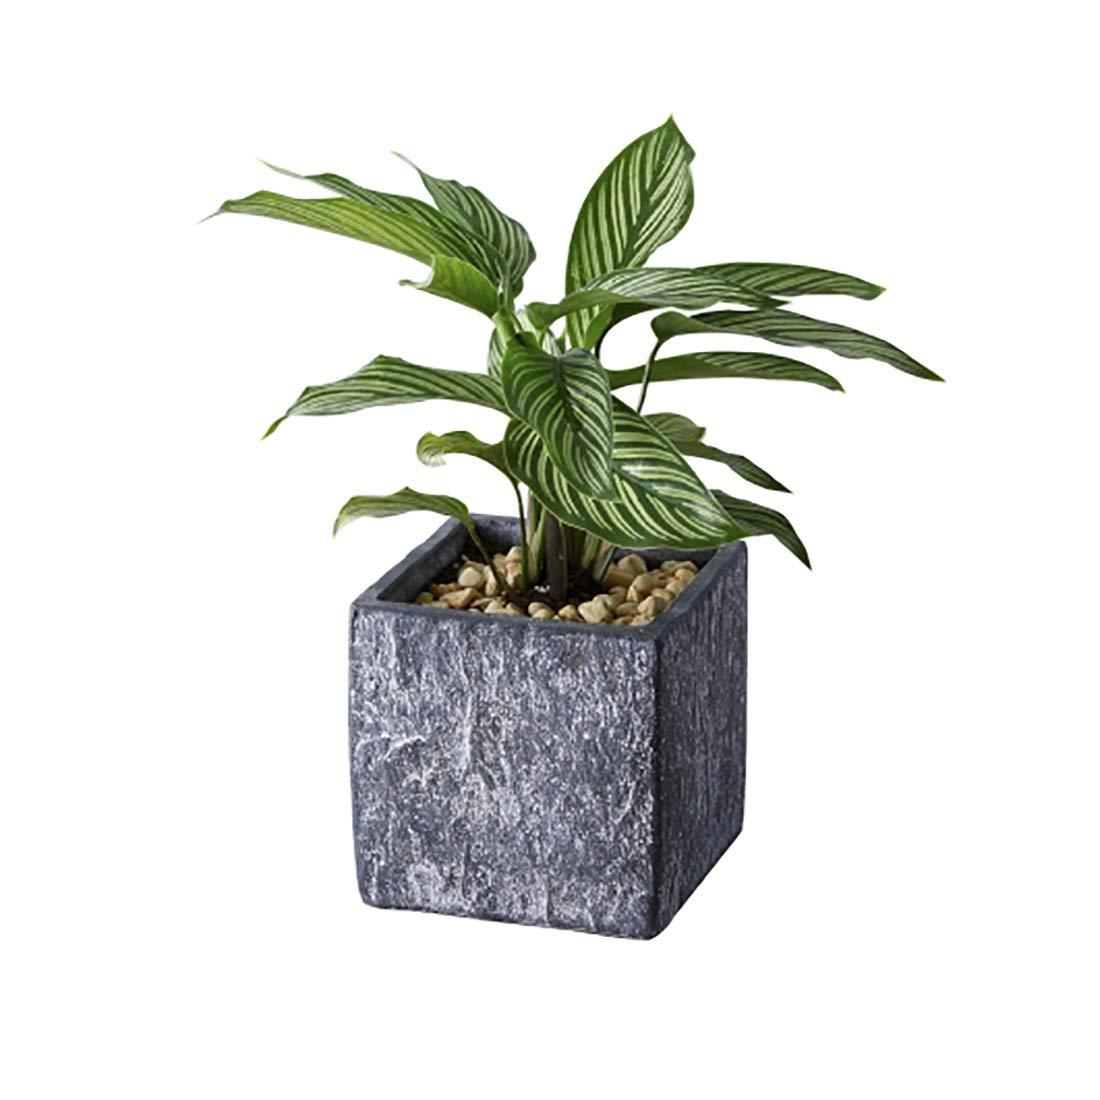 Zhi lian& 鉢植えポット通気性花鉢 (色 : Gray, サイズ さいず : 15x15x15cm) B07QMBHCZF Gray 15x15x15cm